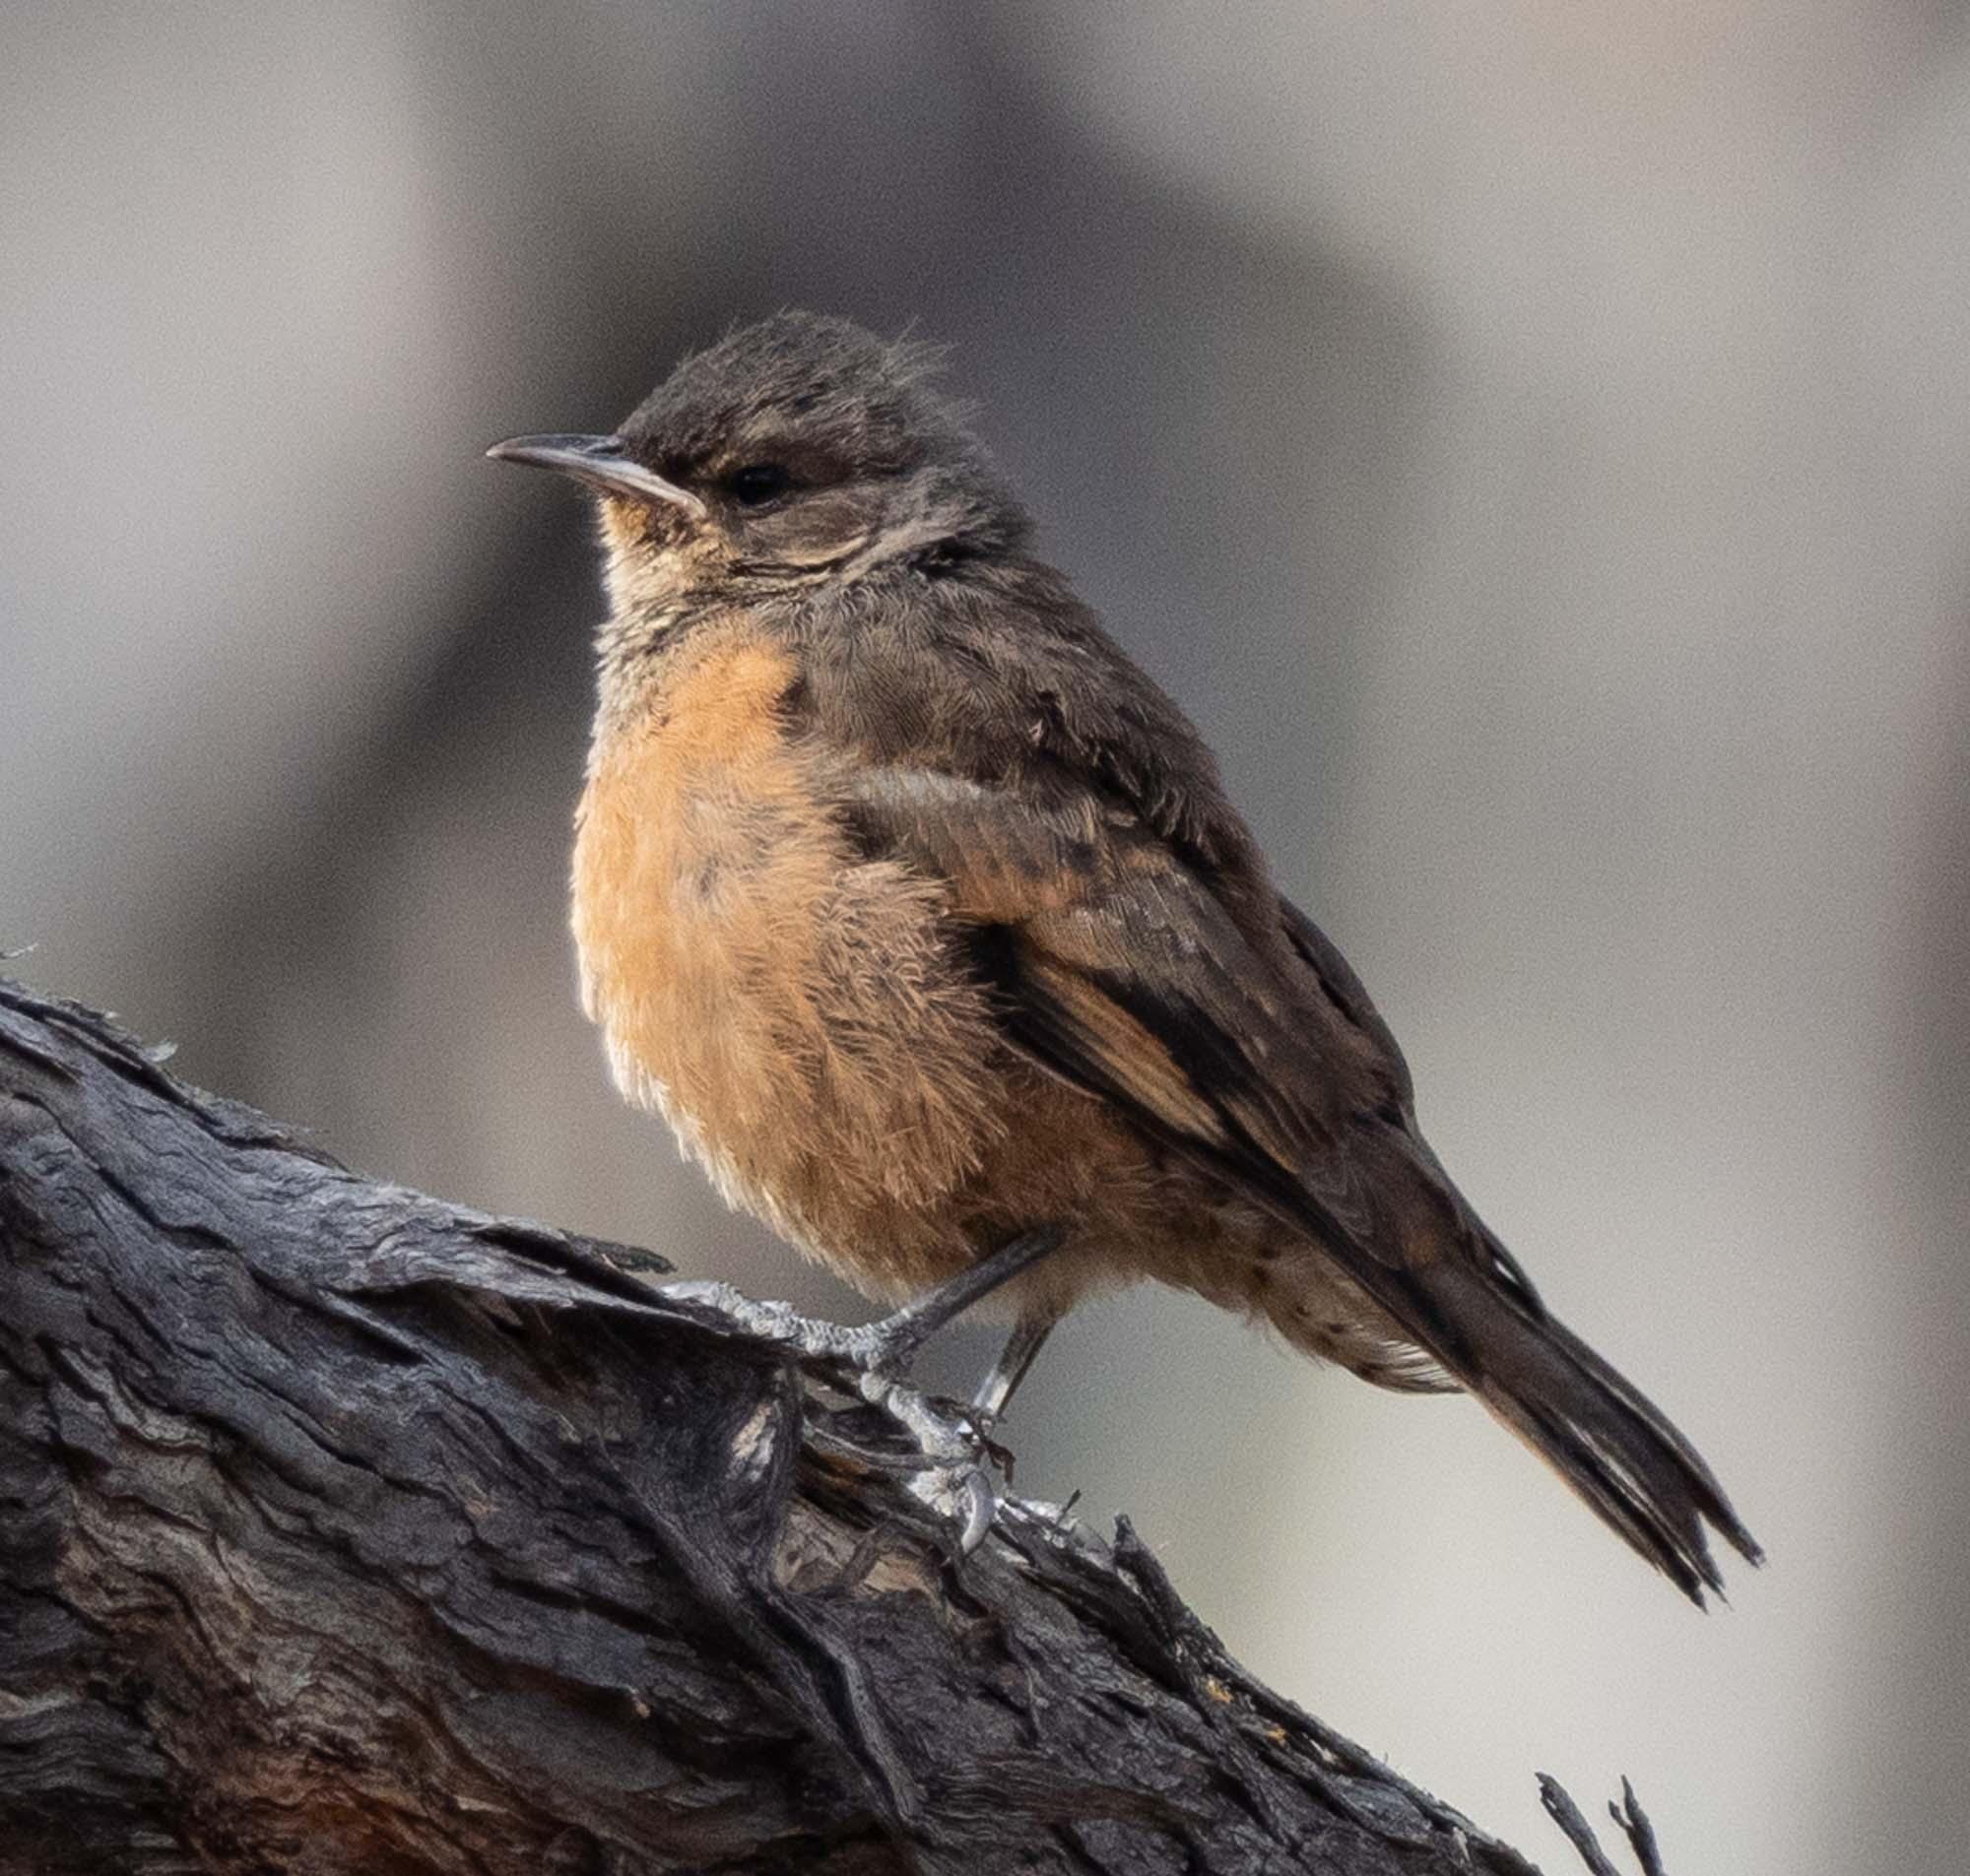 Rufous Treecreeper - juvenile